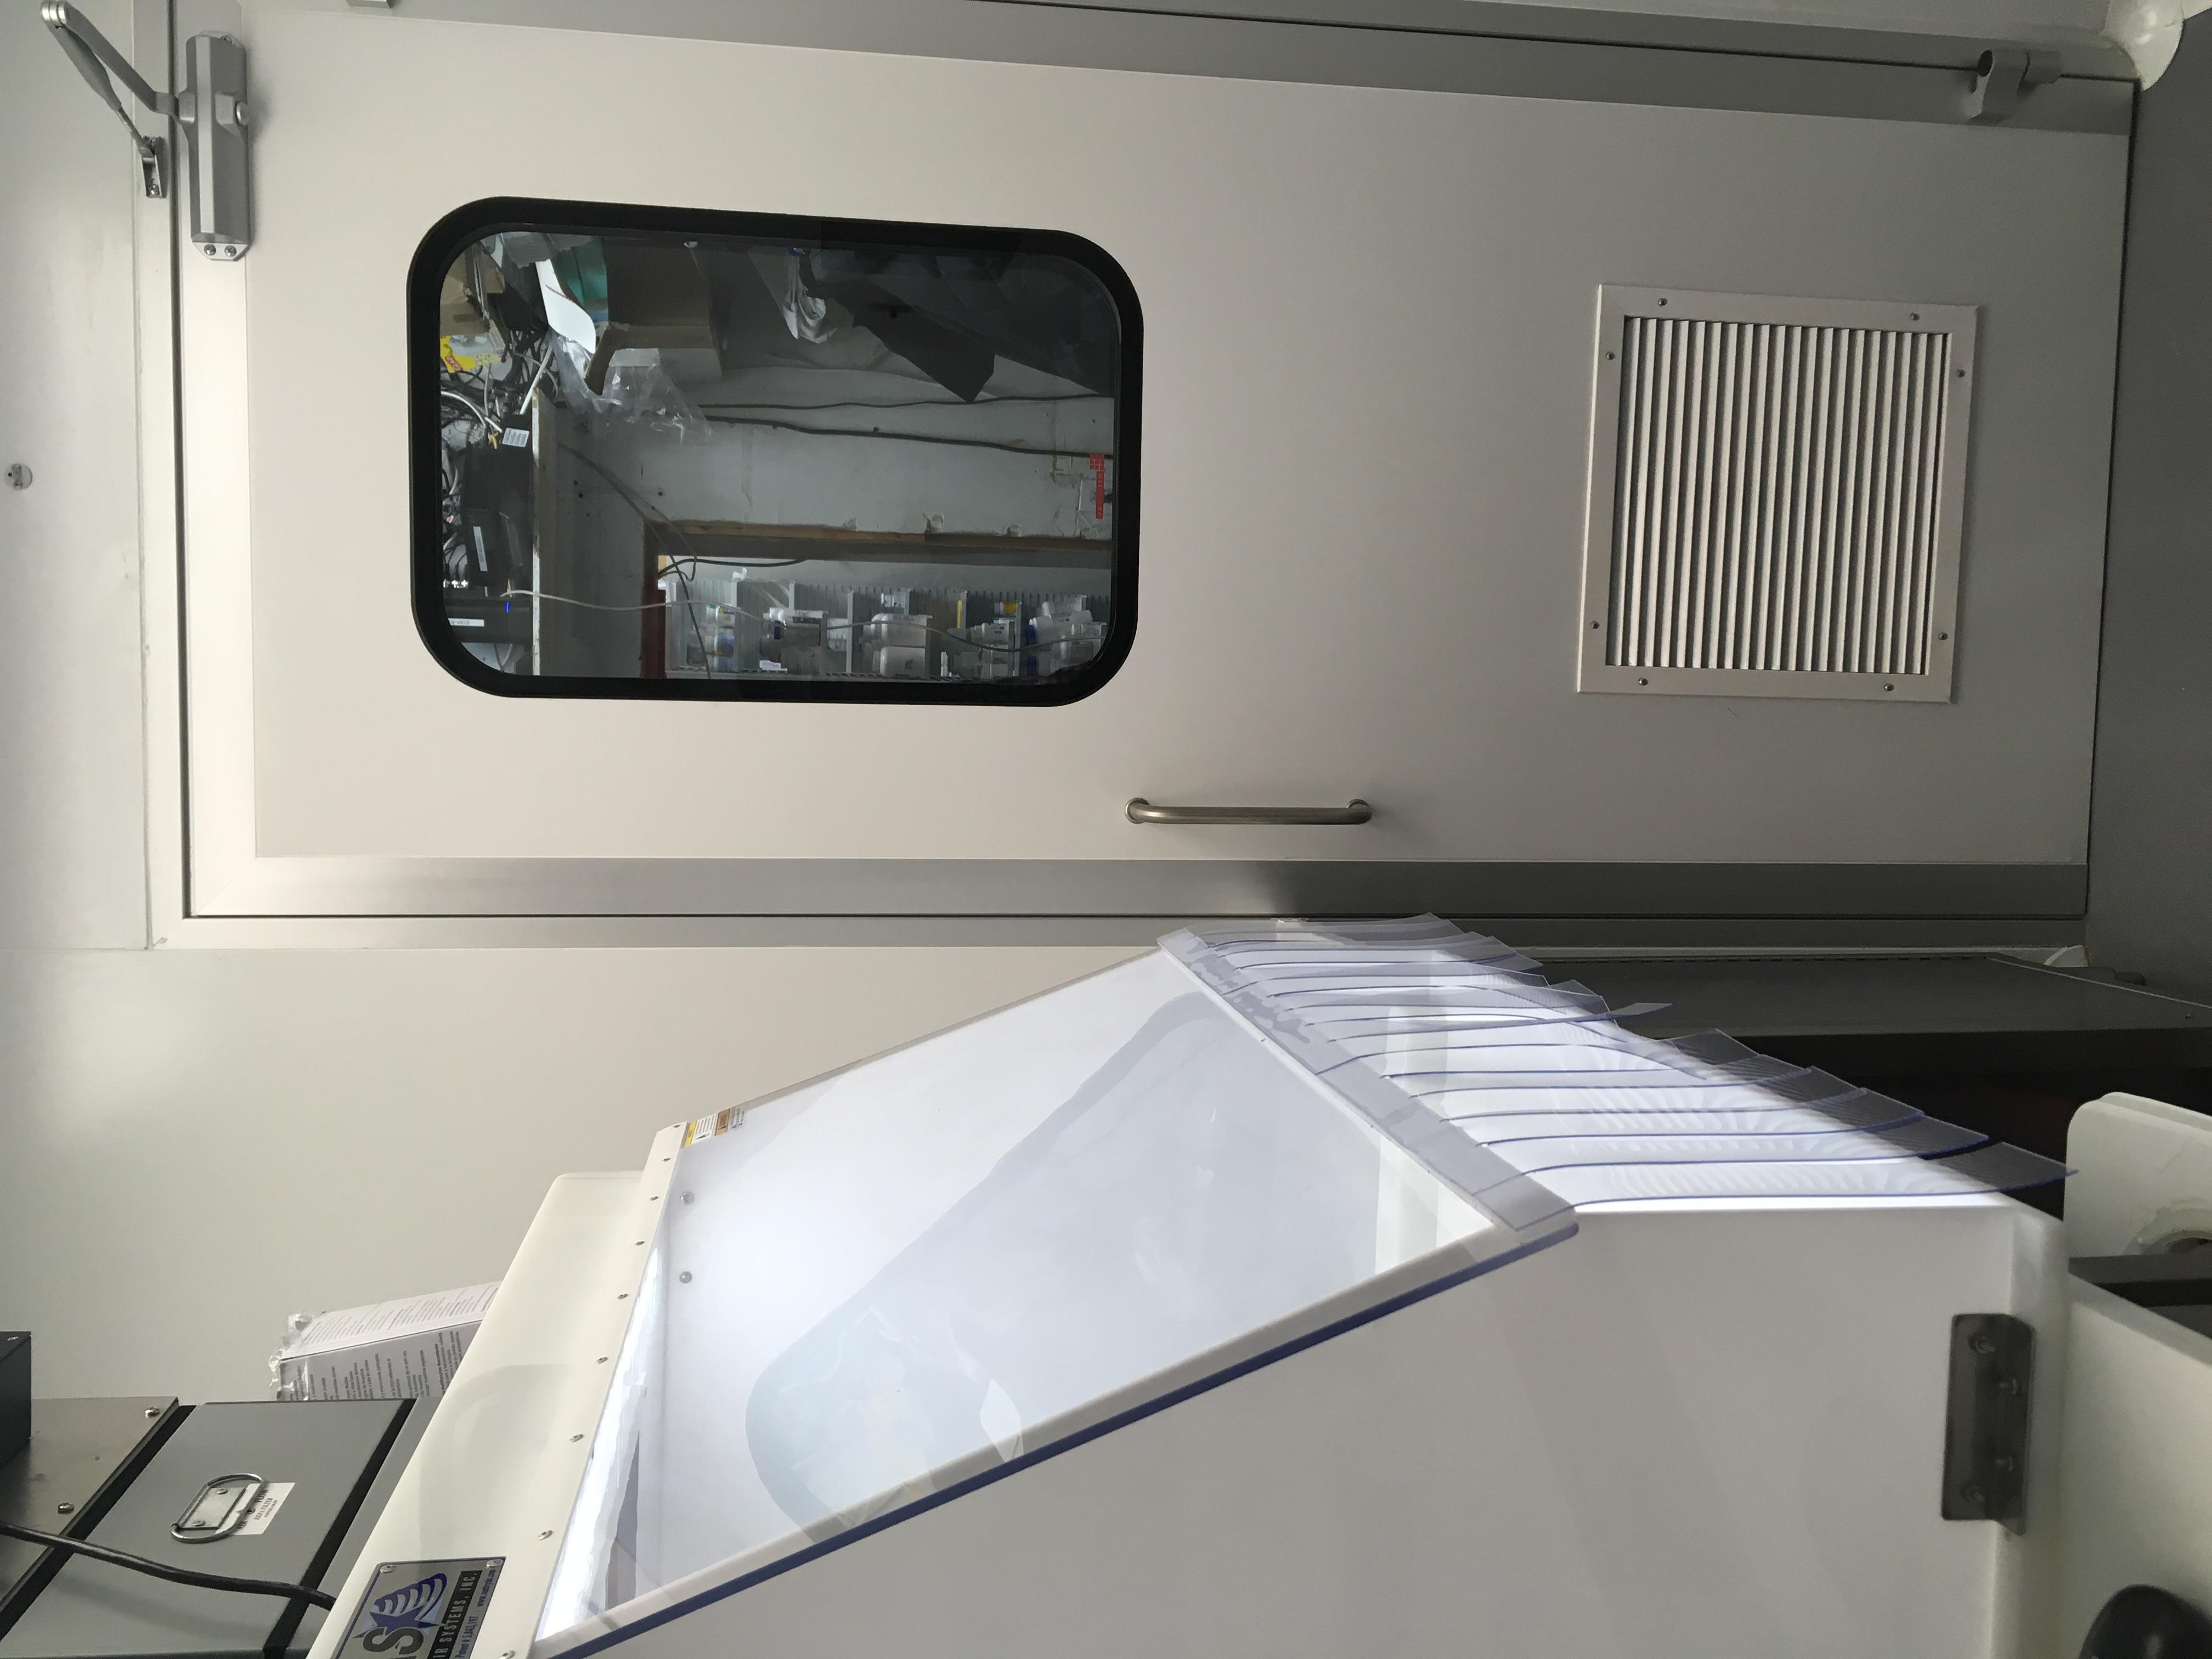 Nicomac anti scratch cleanroom panels and cleanroom doors